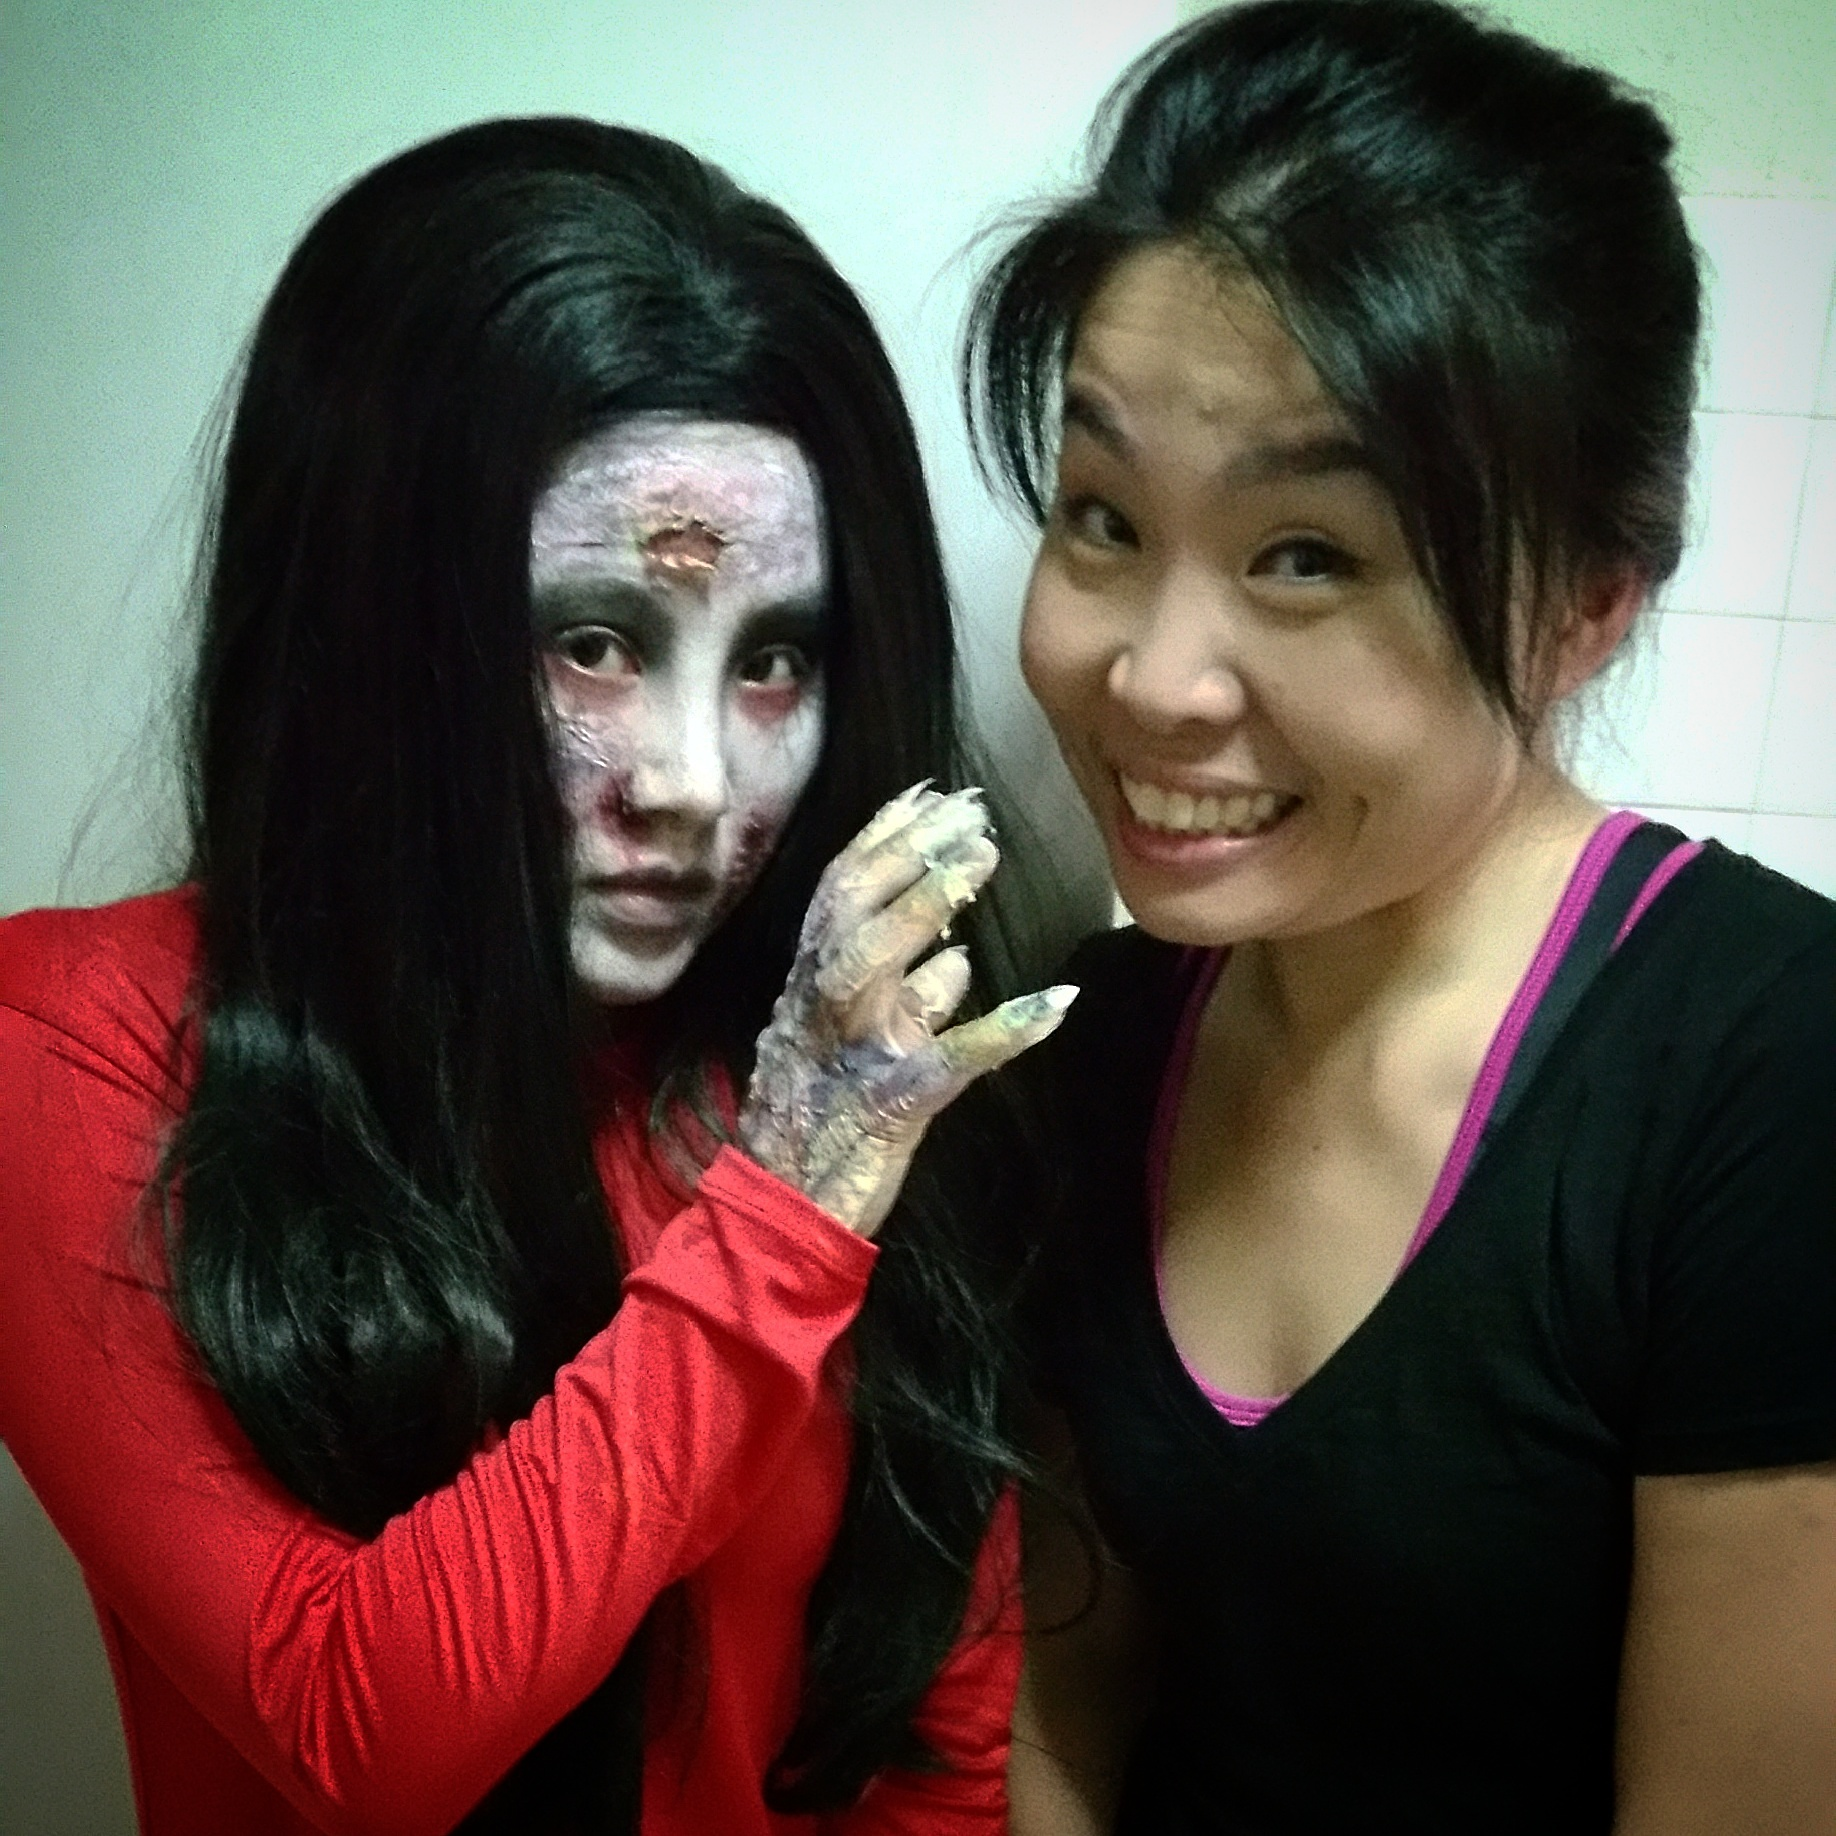 Ghostly Makeup for short flim